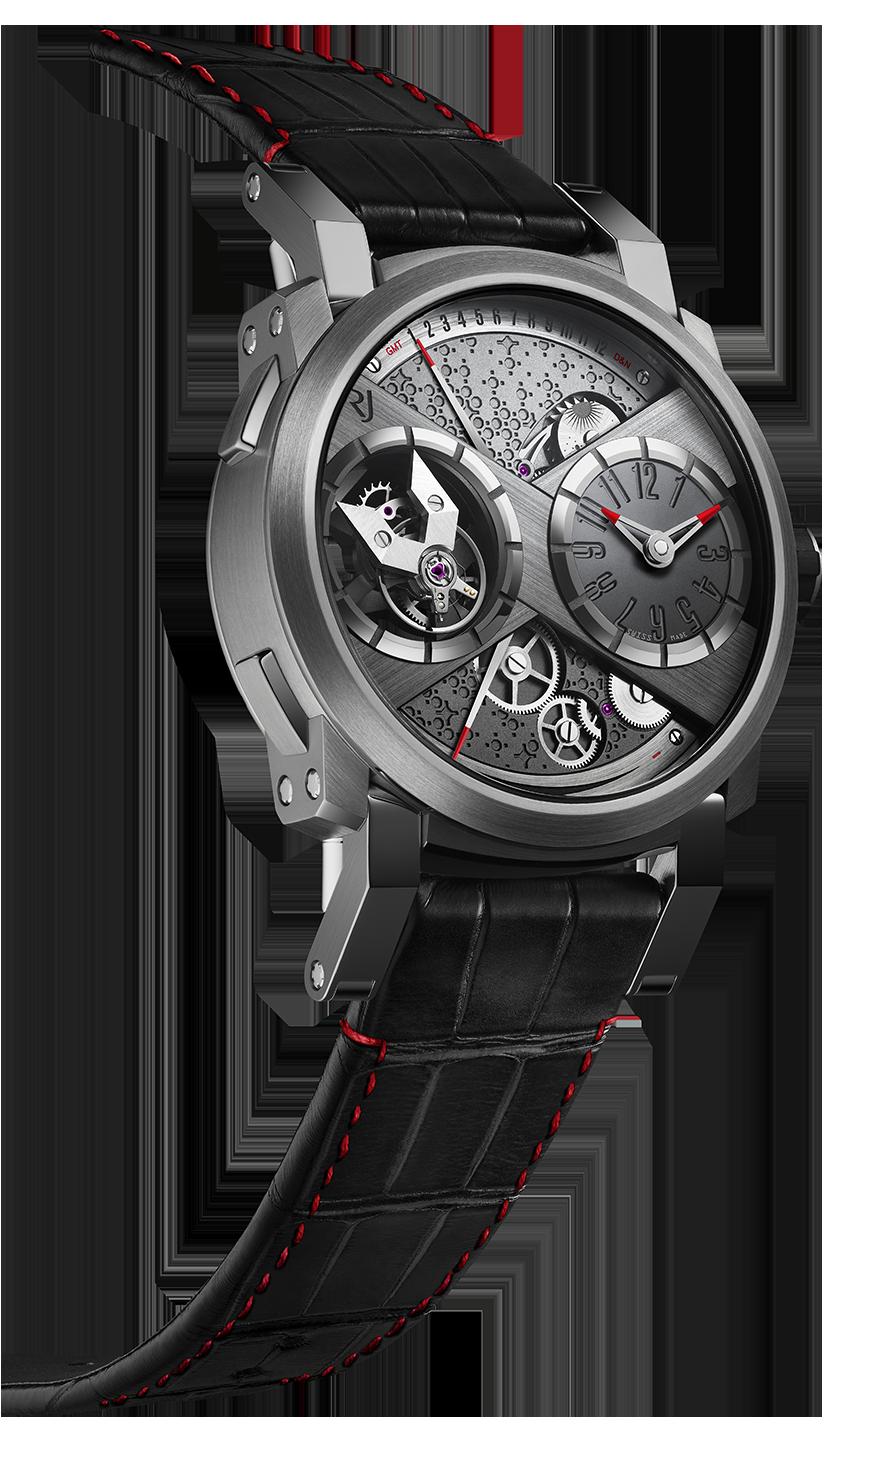 Military Time Clock >> Romain Jerome Moon Orbiter GMT - watchuseek.com